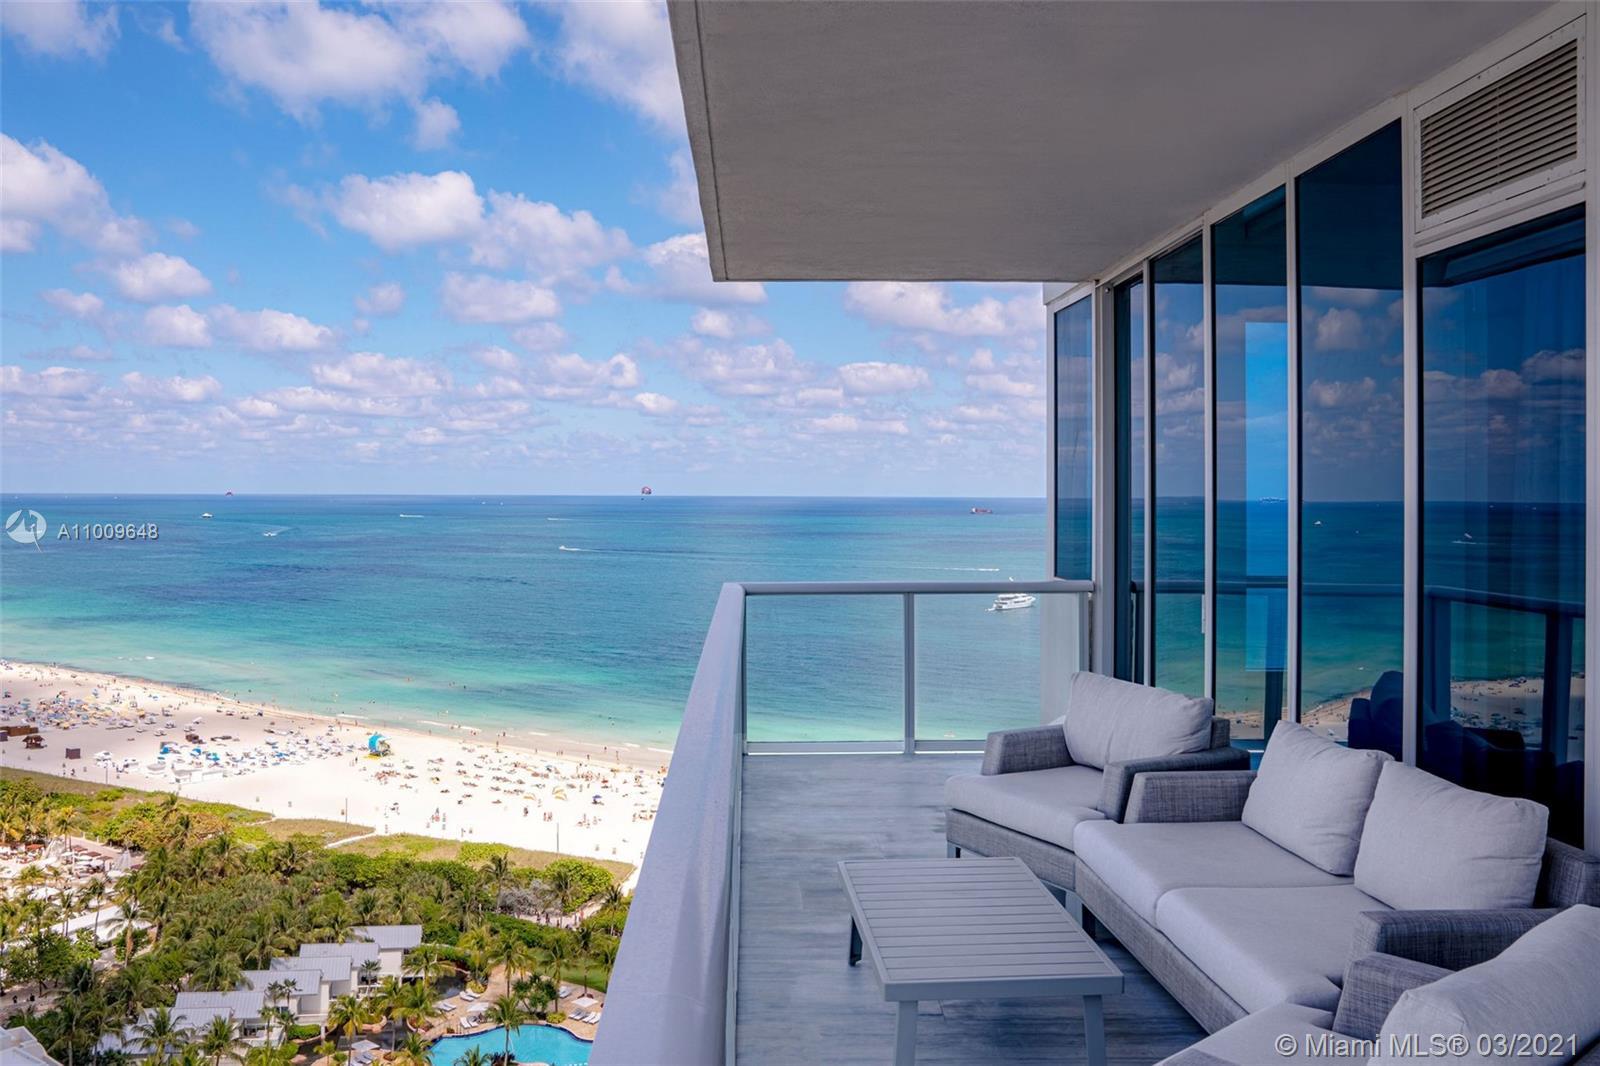 100 Pointe Dr Unit 2110, Miami Beach, Florida 33139